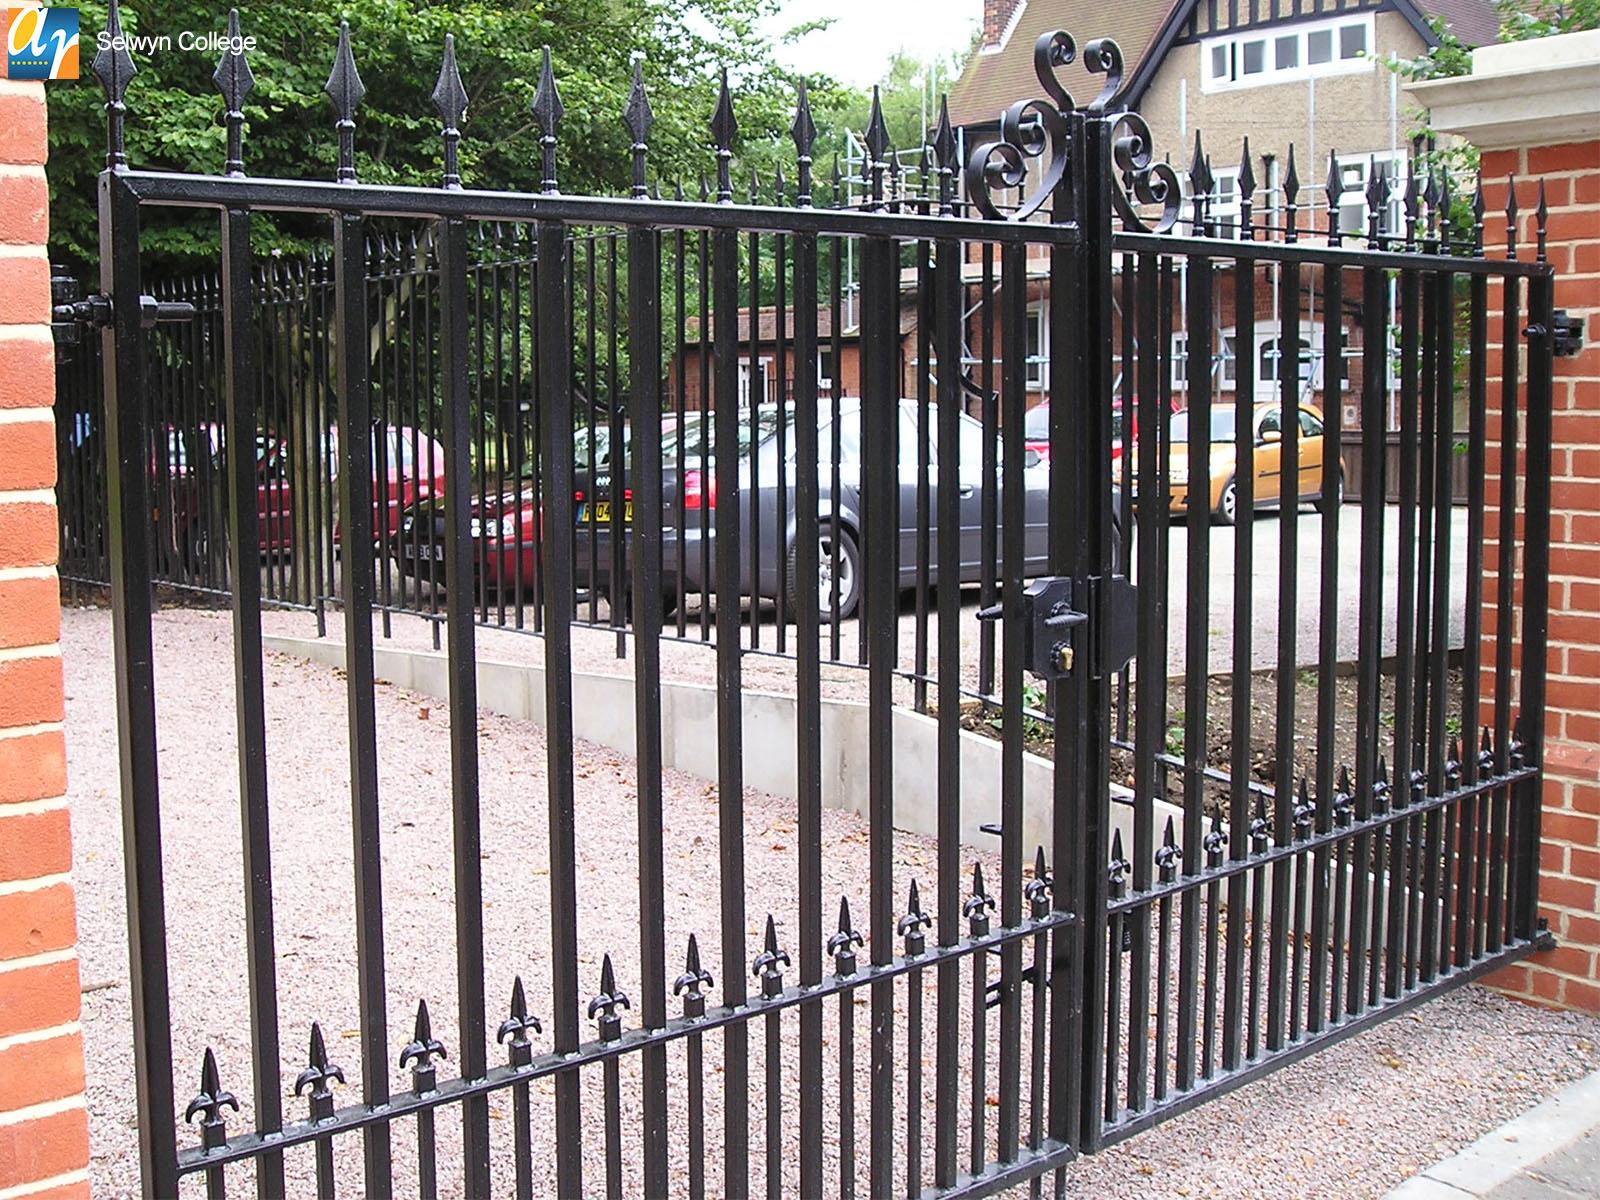 Selwyn College metal gates